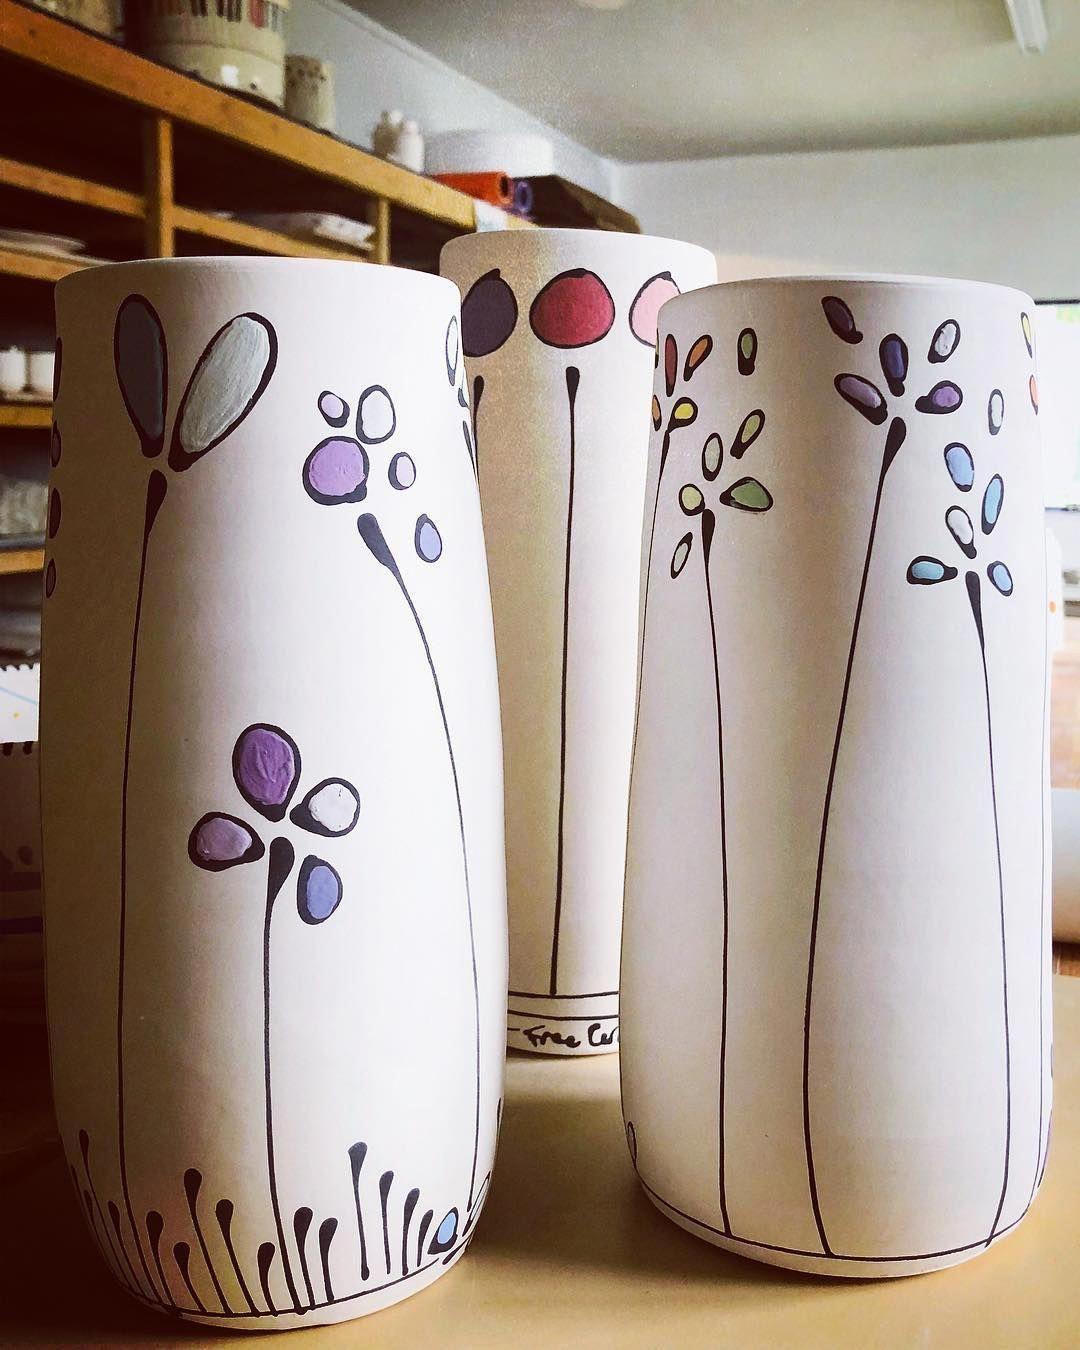 Porcelain Manufacturer Uk Porcelaintilesforchinapainting Pottery Painting Designs Vases Decor Pottery Vase